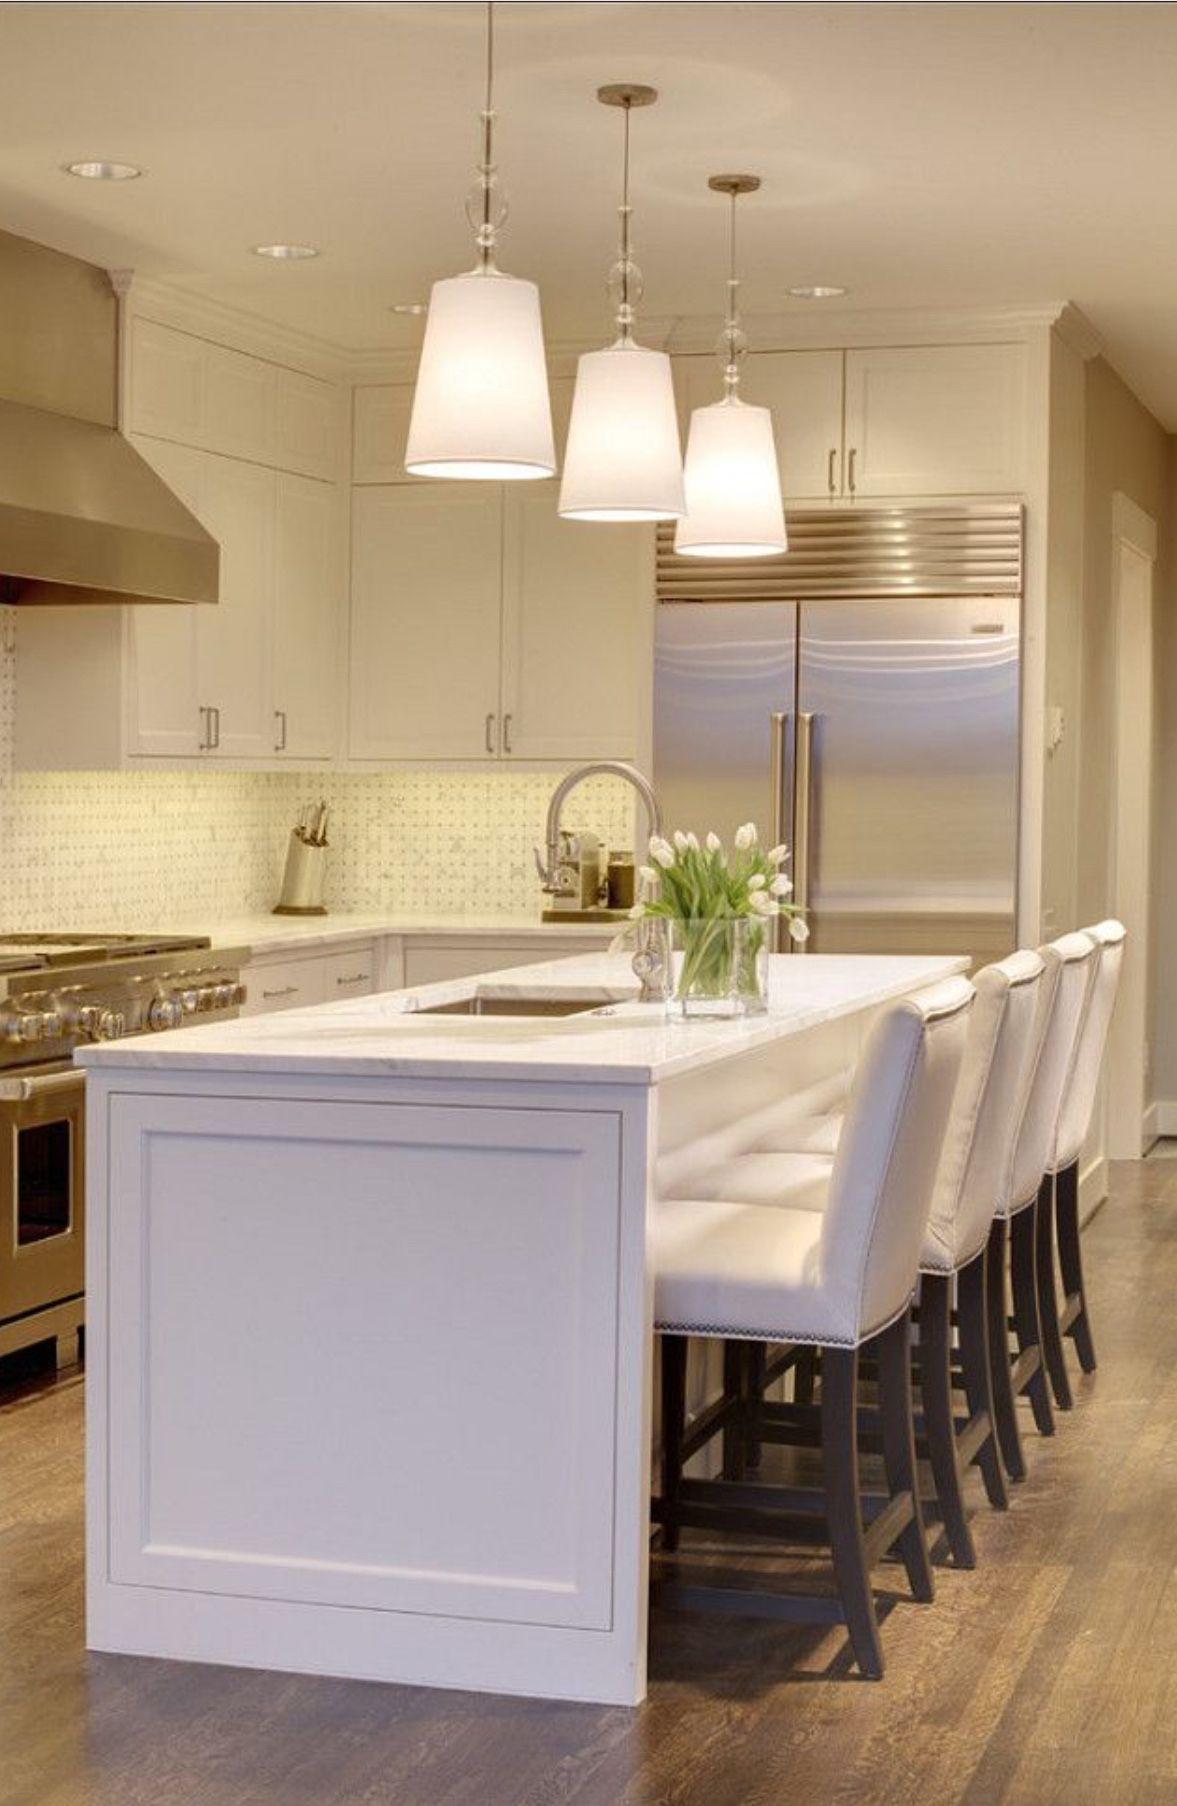 Beautiful kitchen. Tiled splash back and awesome White